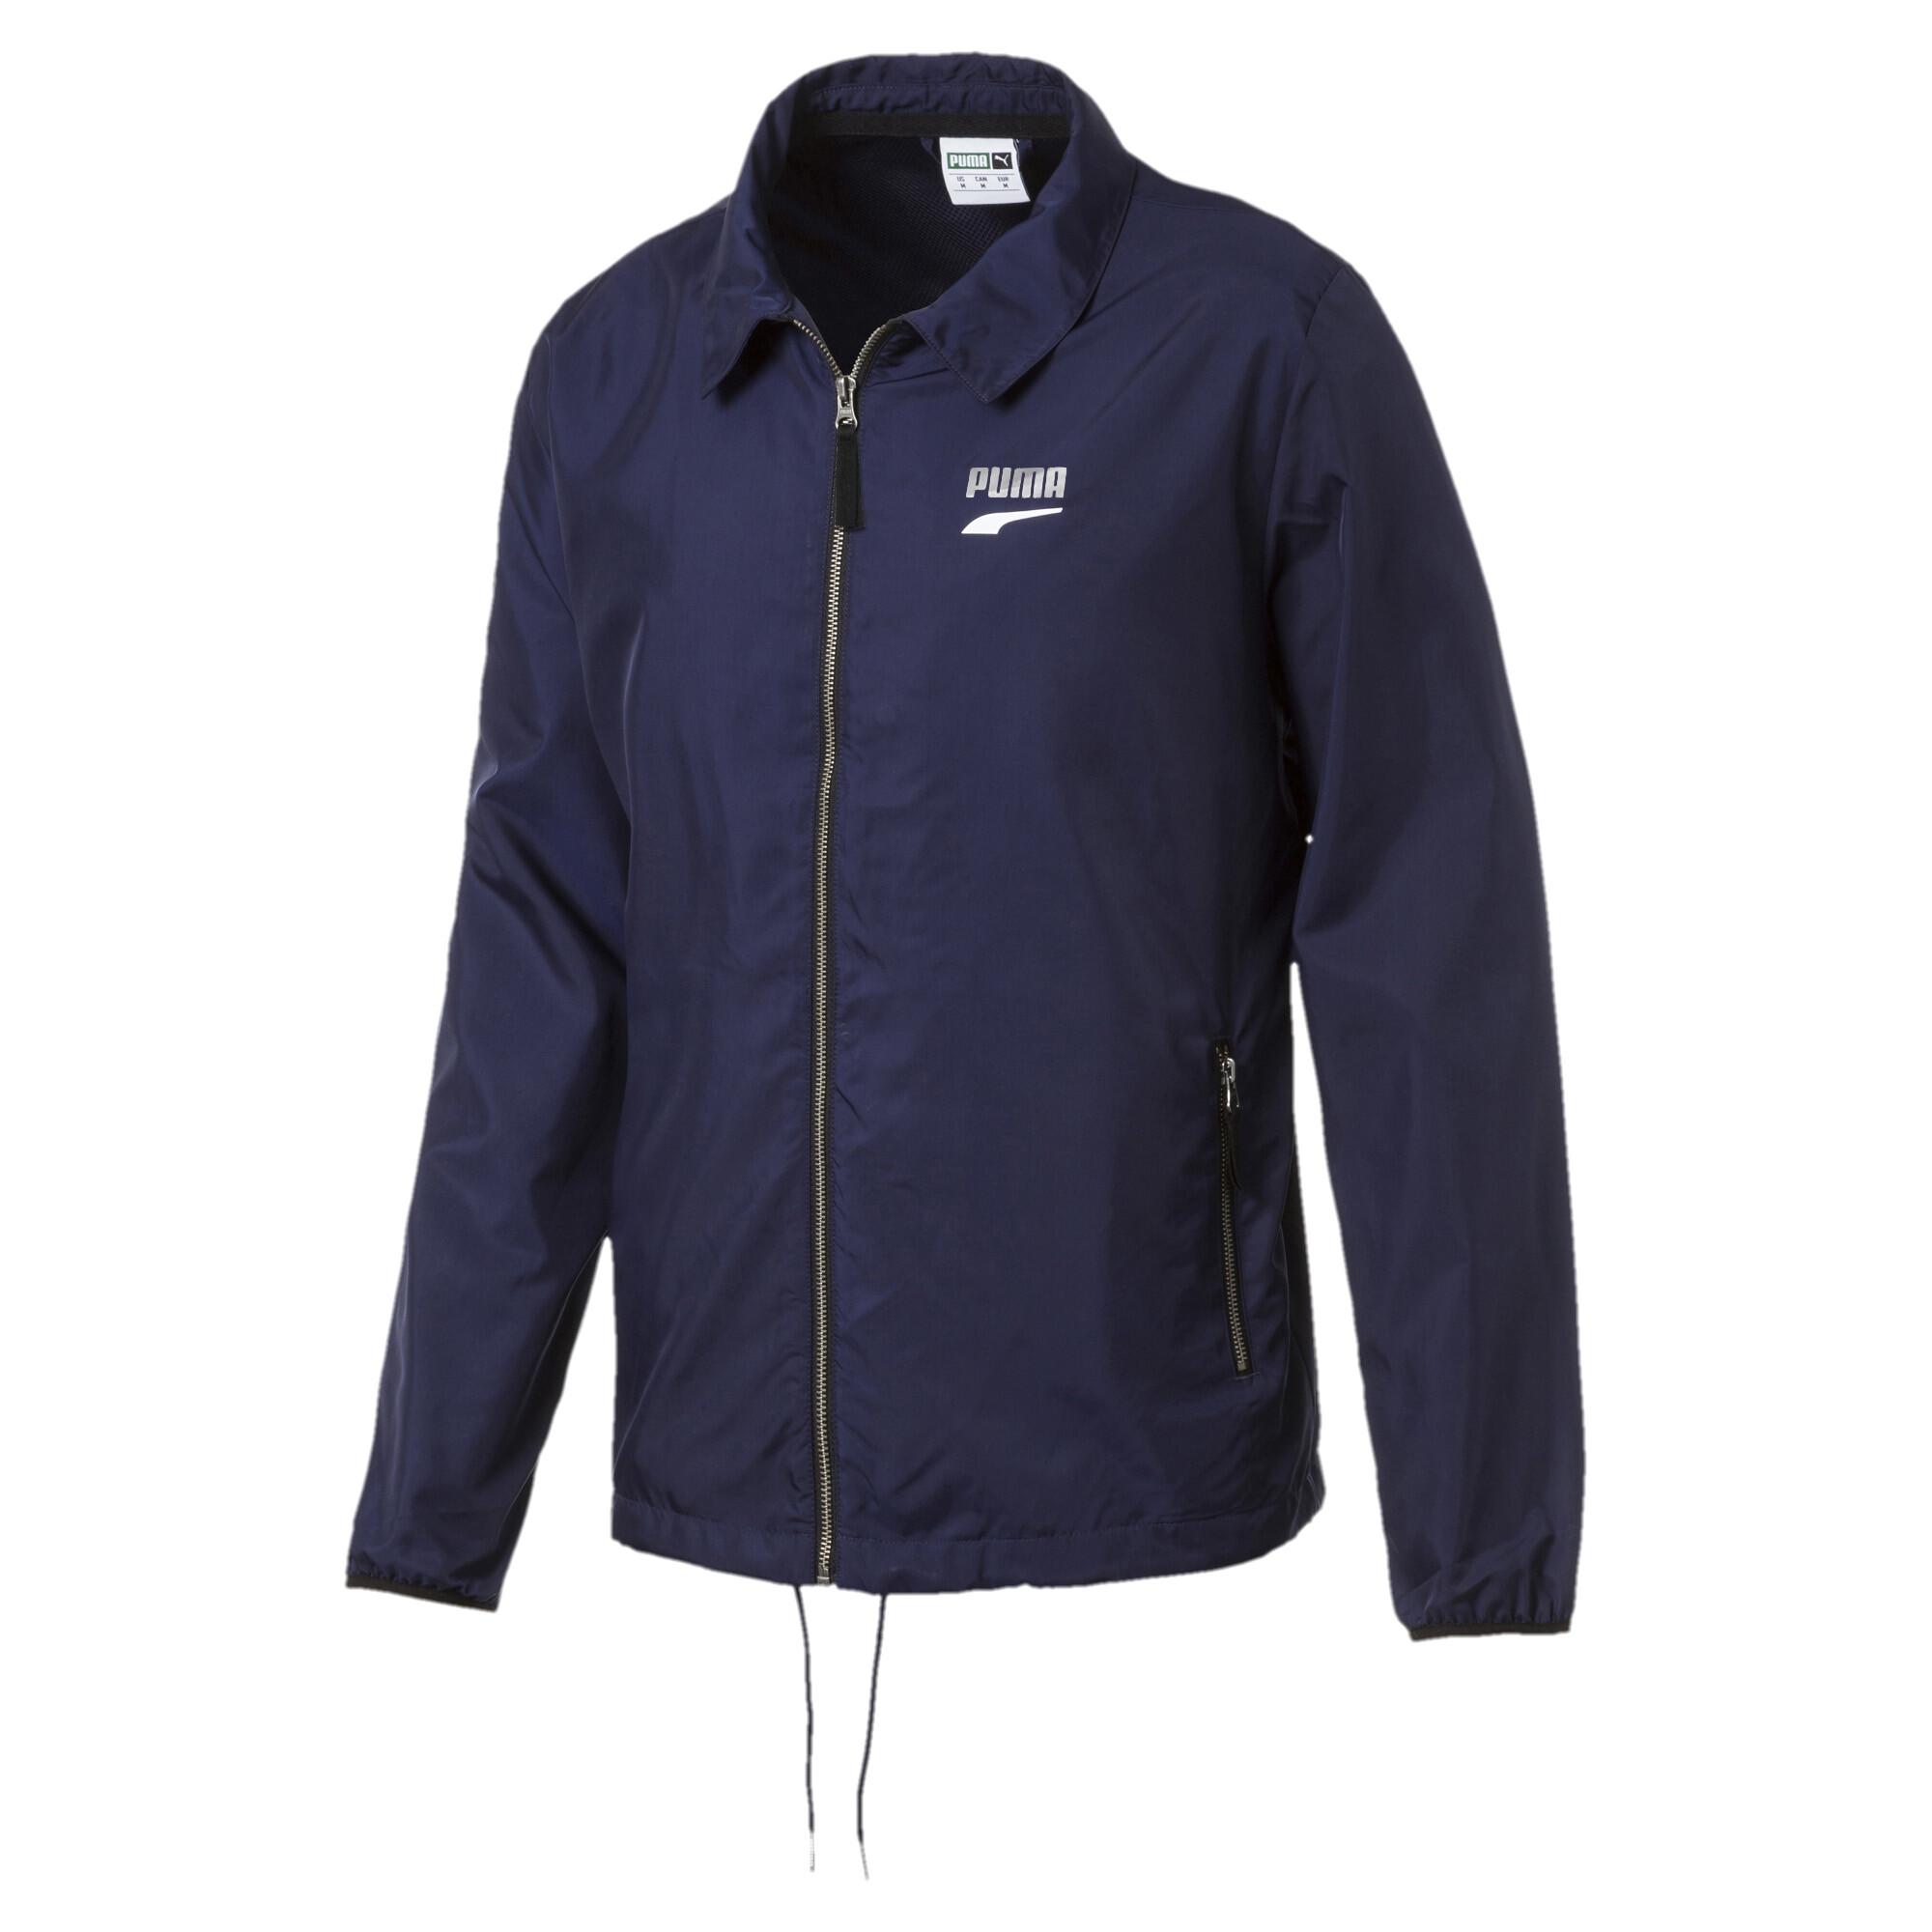 Image Puma Downtown Full Zip Men's Track Jacket #1